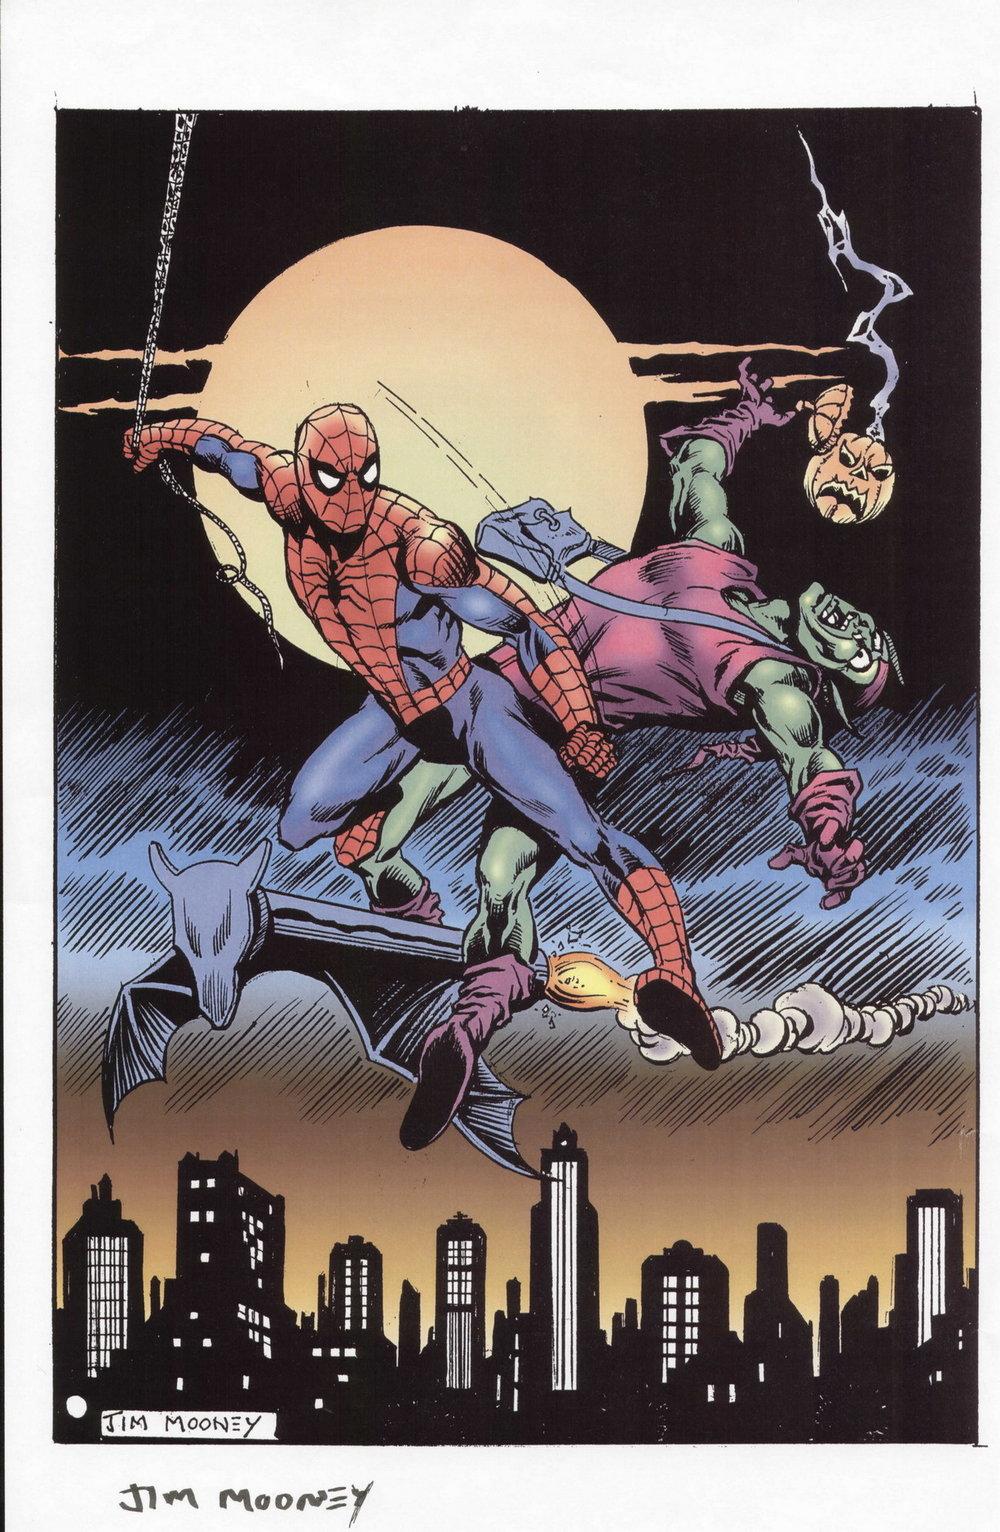 Spider-Man vs. Green Goblin by Jim Mooney.